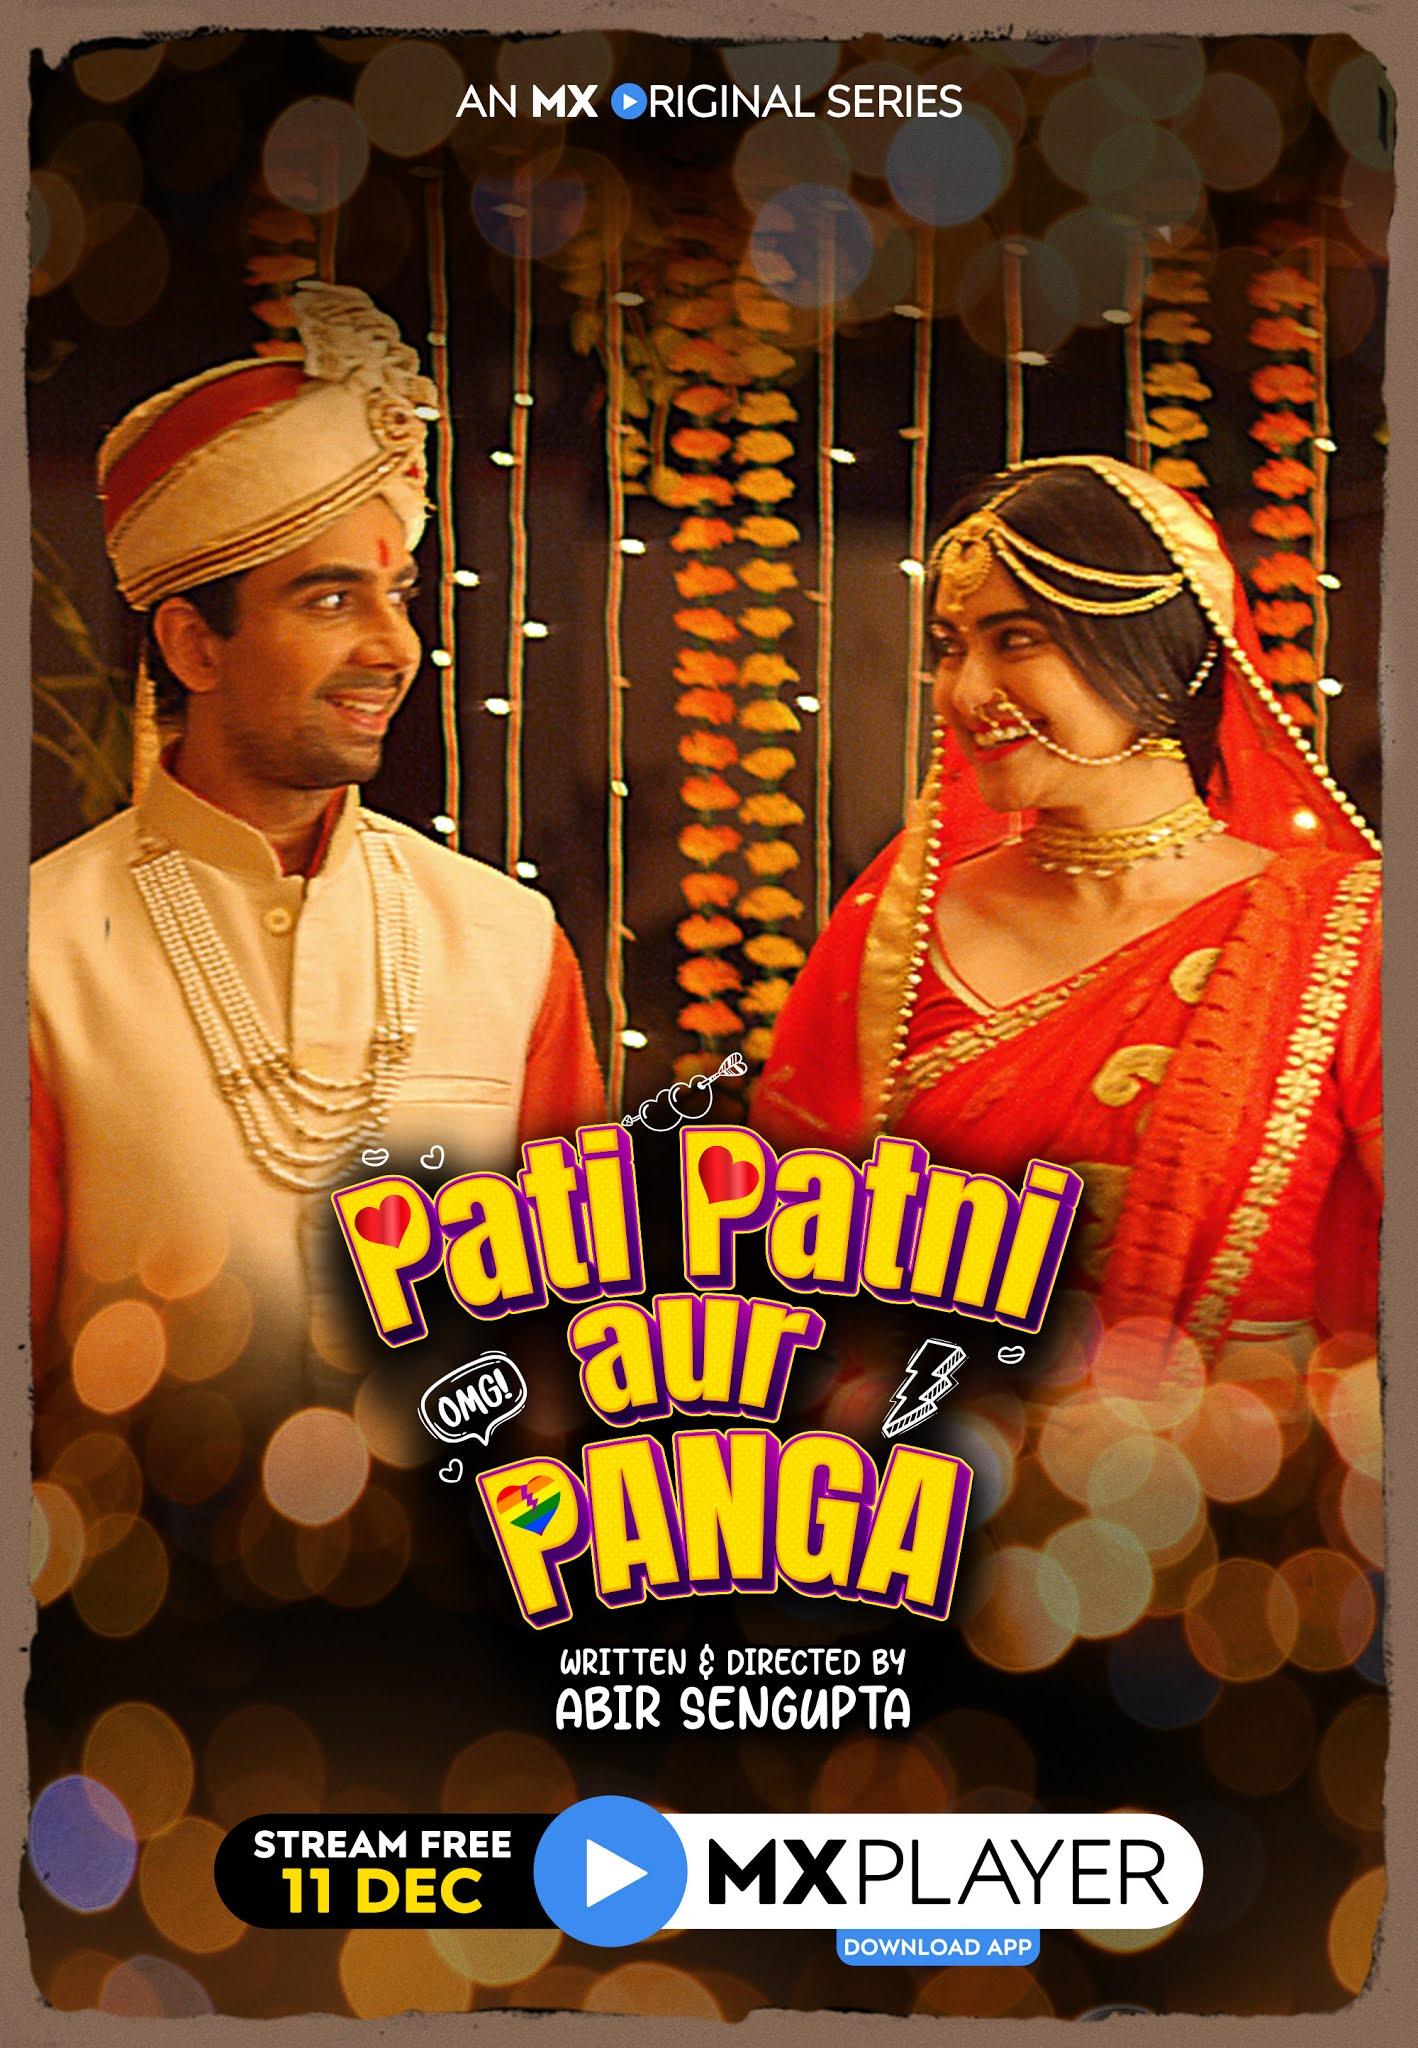 Pati Patni Aur Panga Season 1 Complete